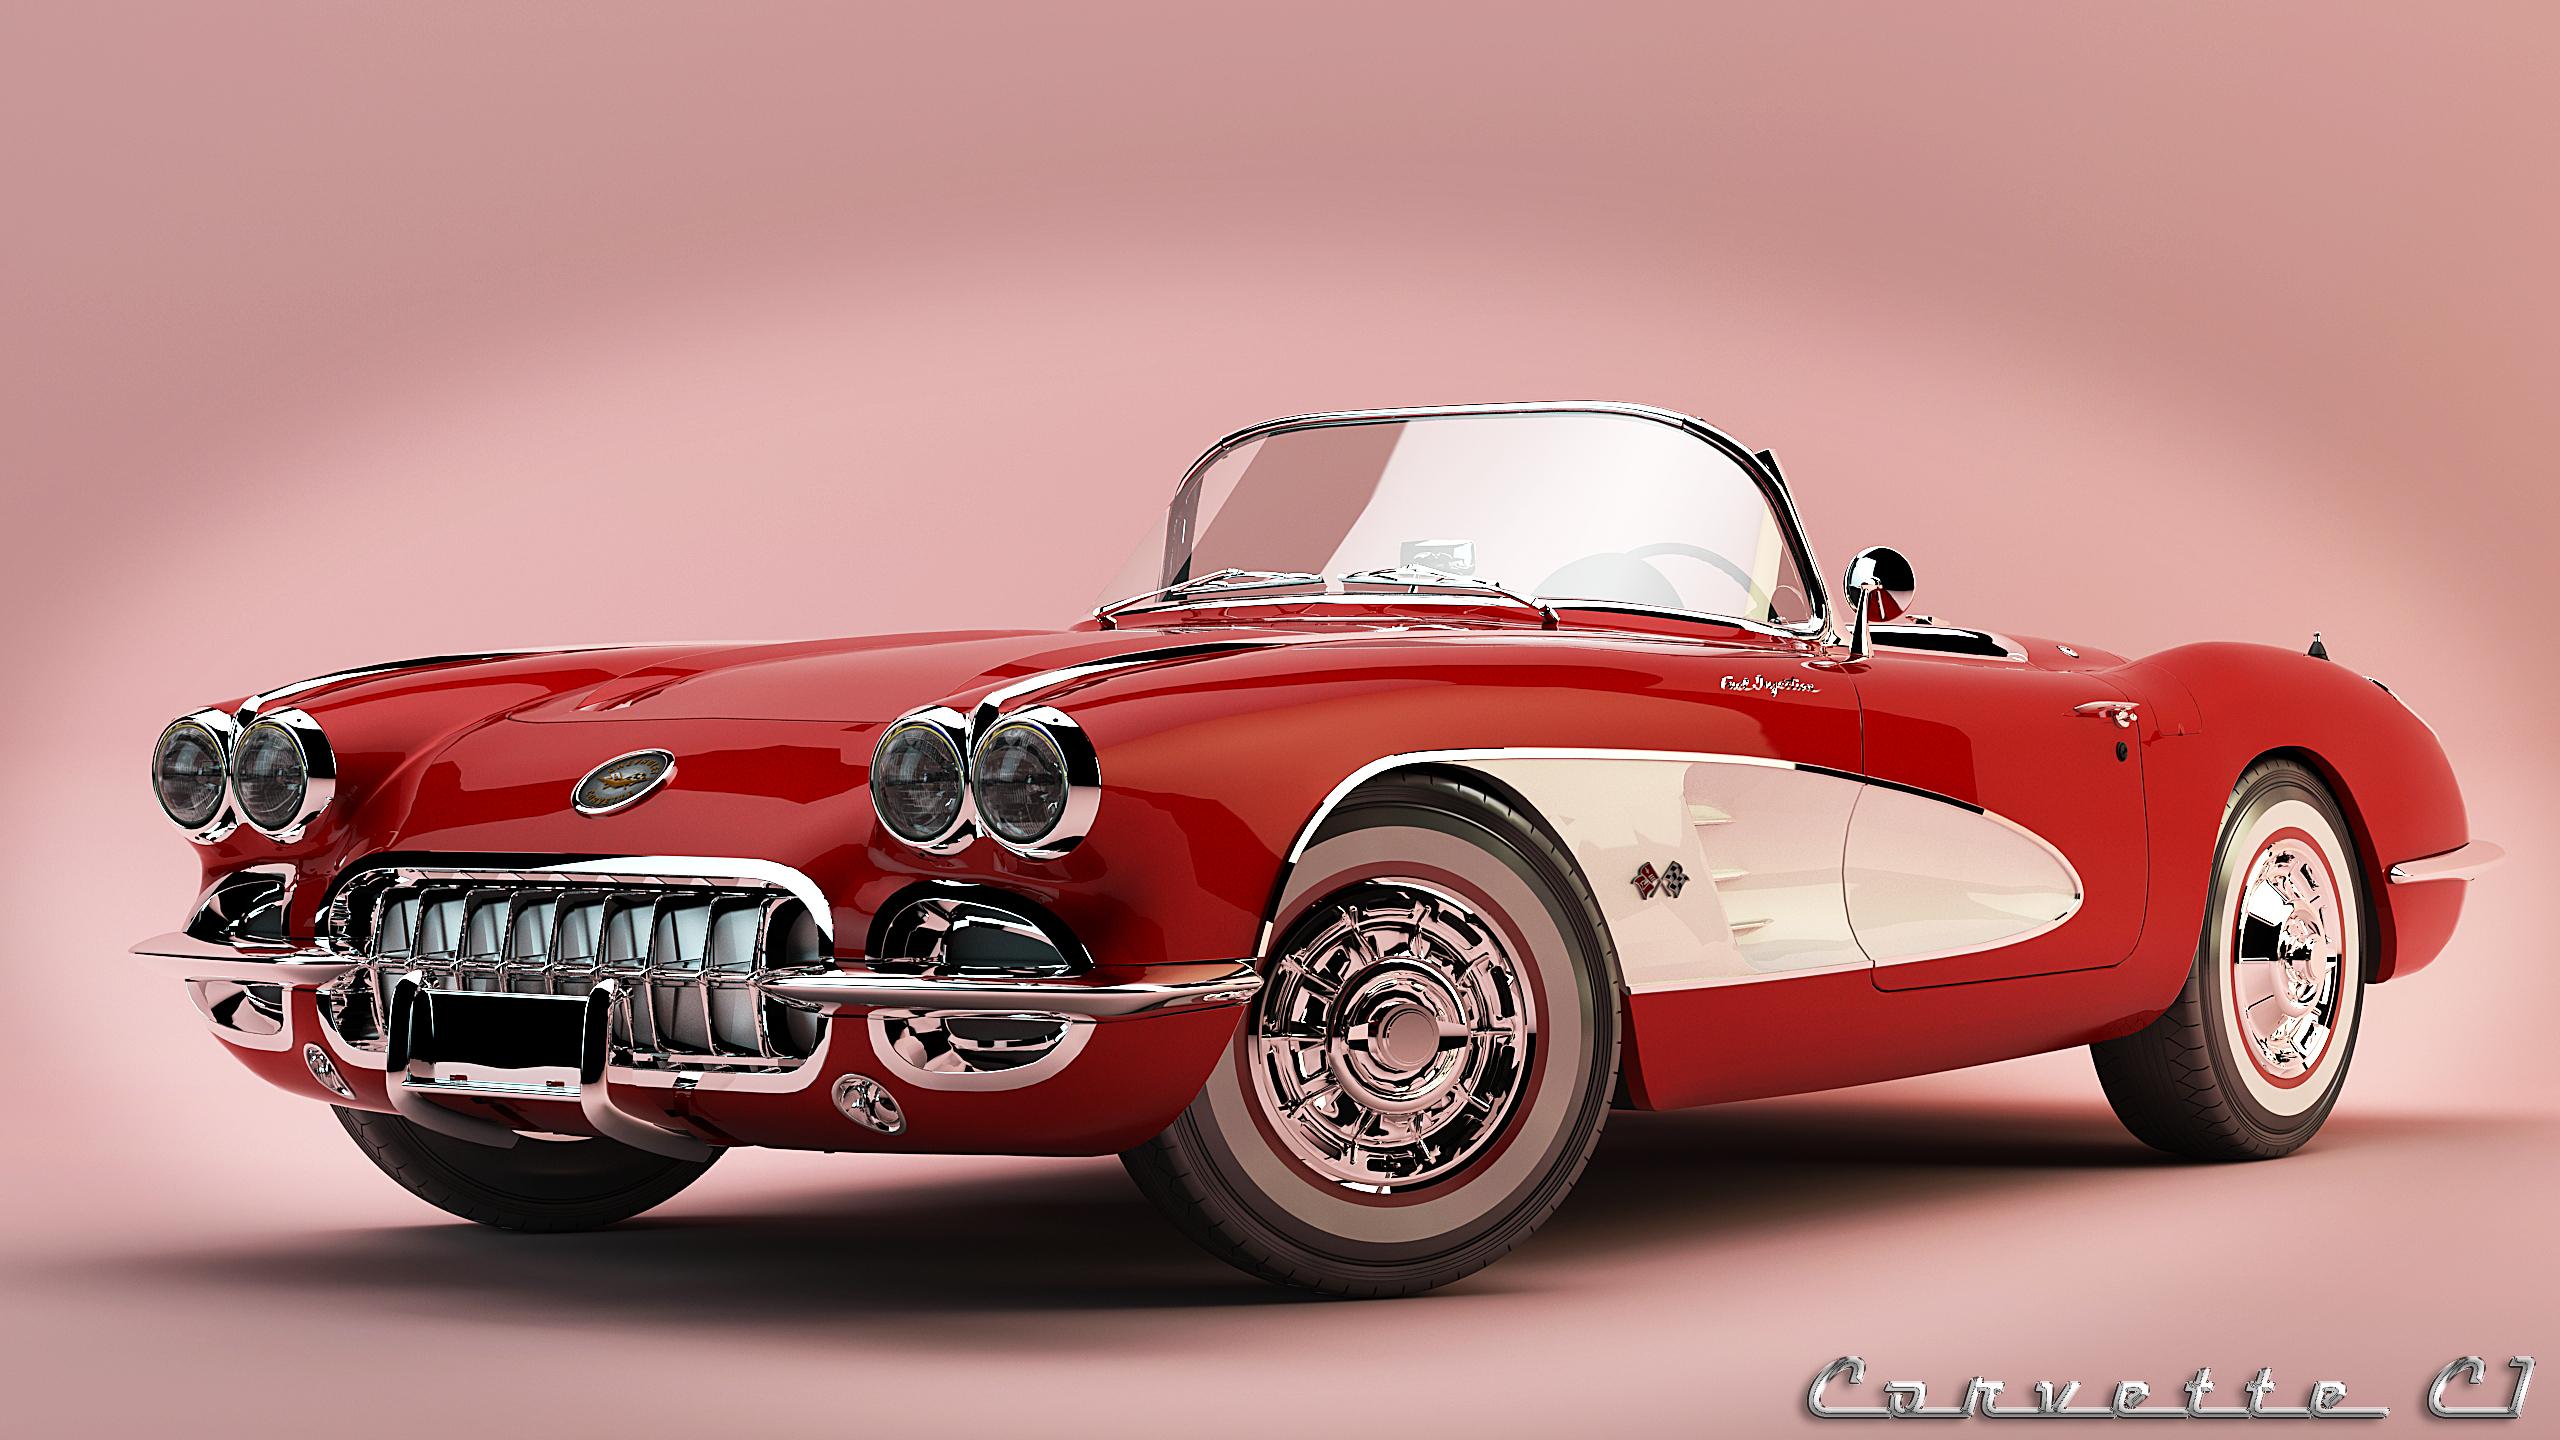 Kekurangan Corvette 1960 Harga